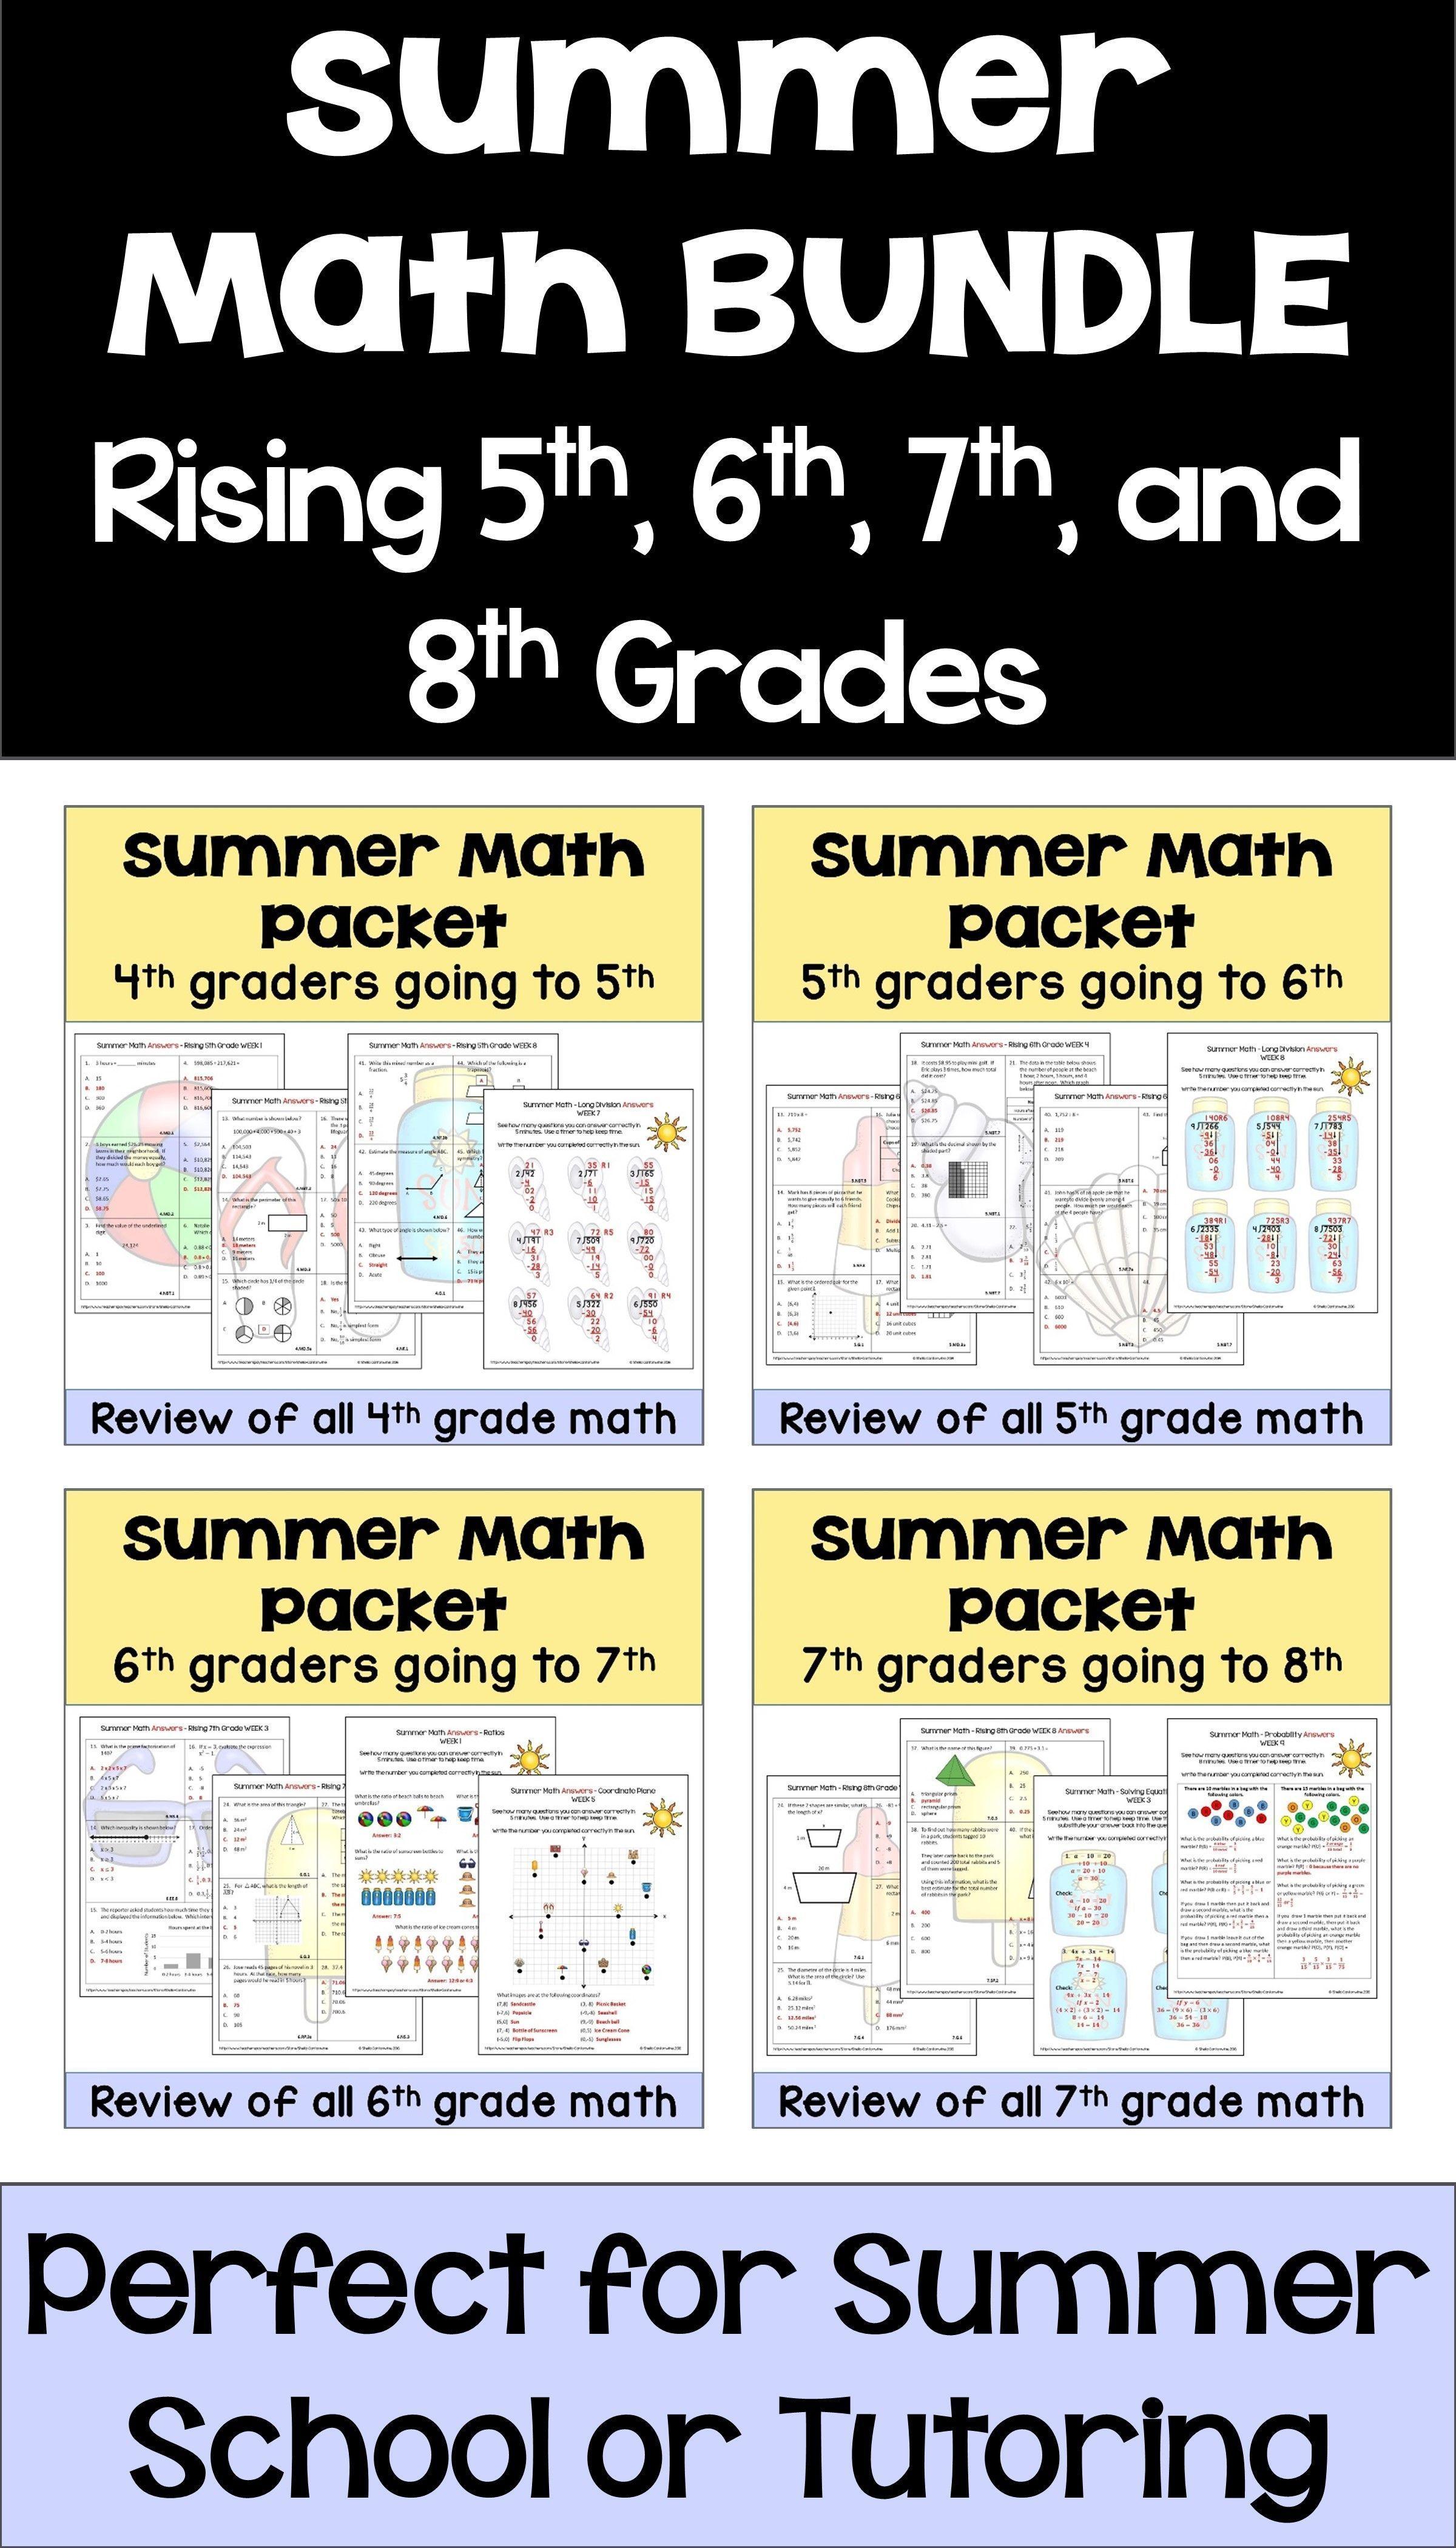 medium resolution of This summer math BUNDLE for rising 5th